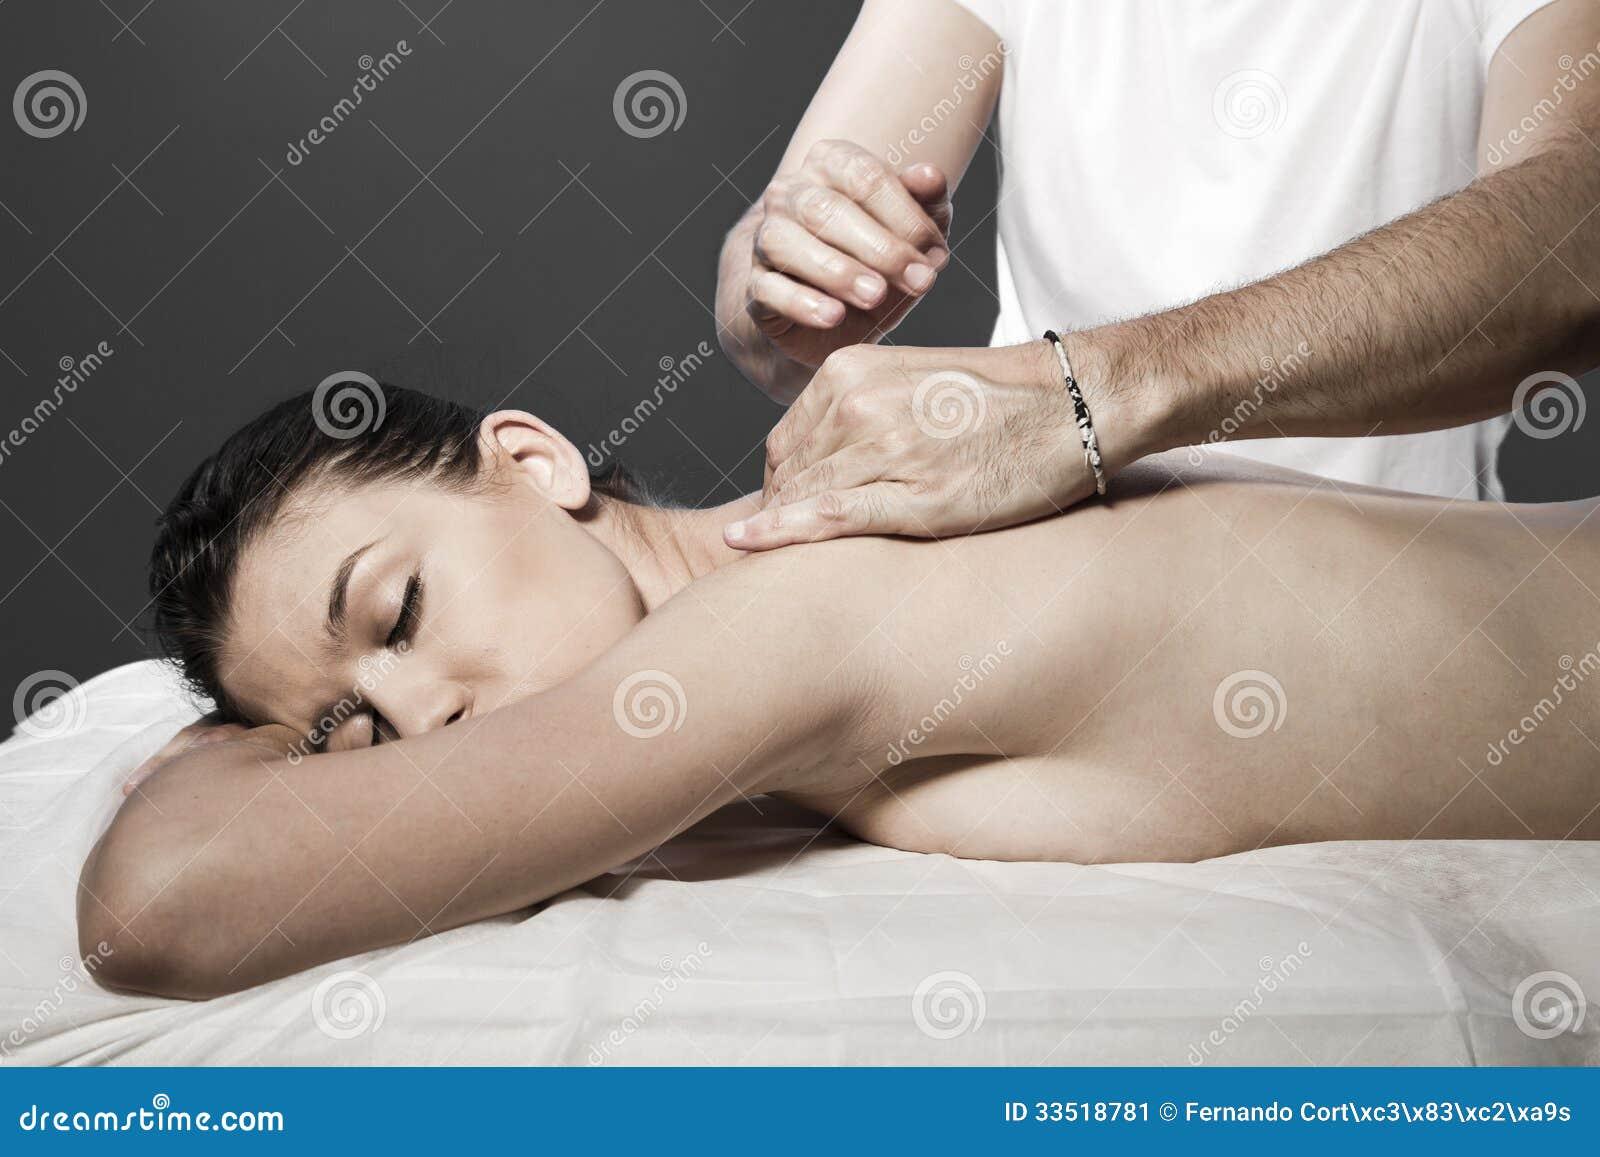 beauty spa erotisk massage gbg